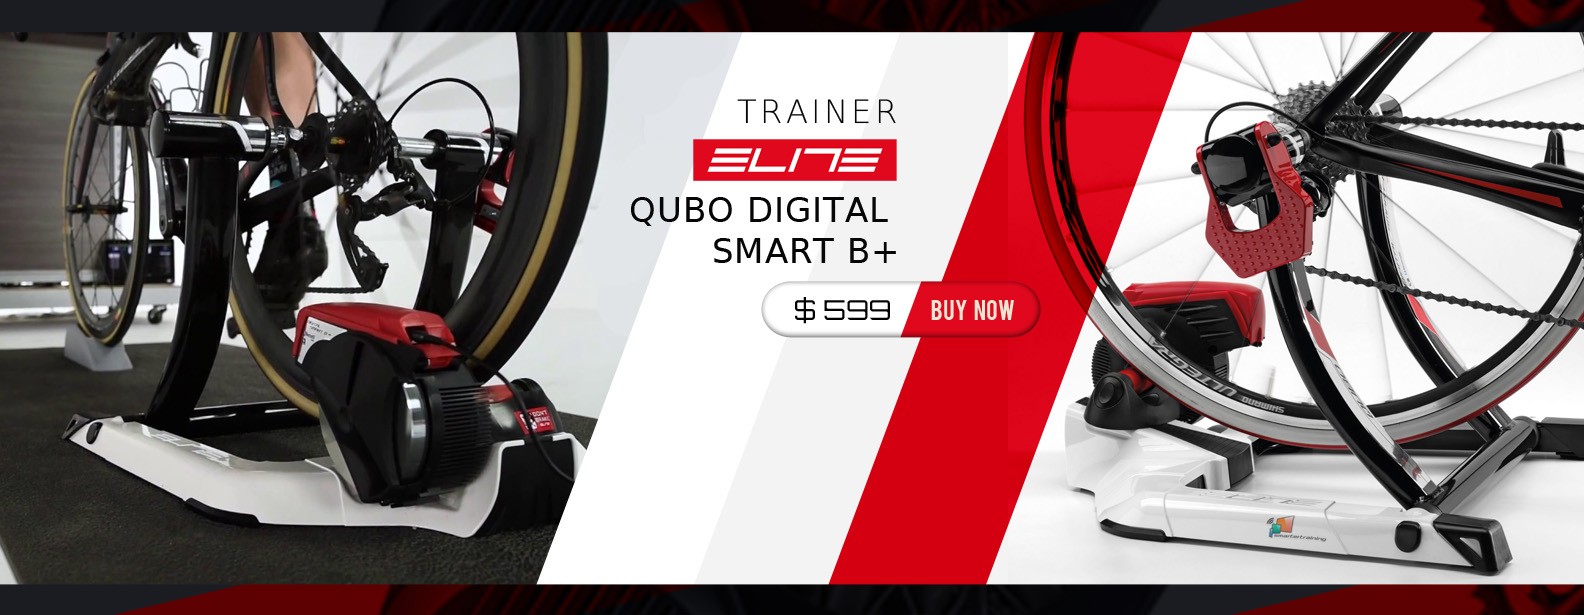 Elite Qubo Digital Smart B+ Bike Trainer